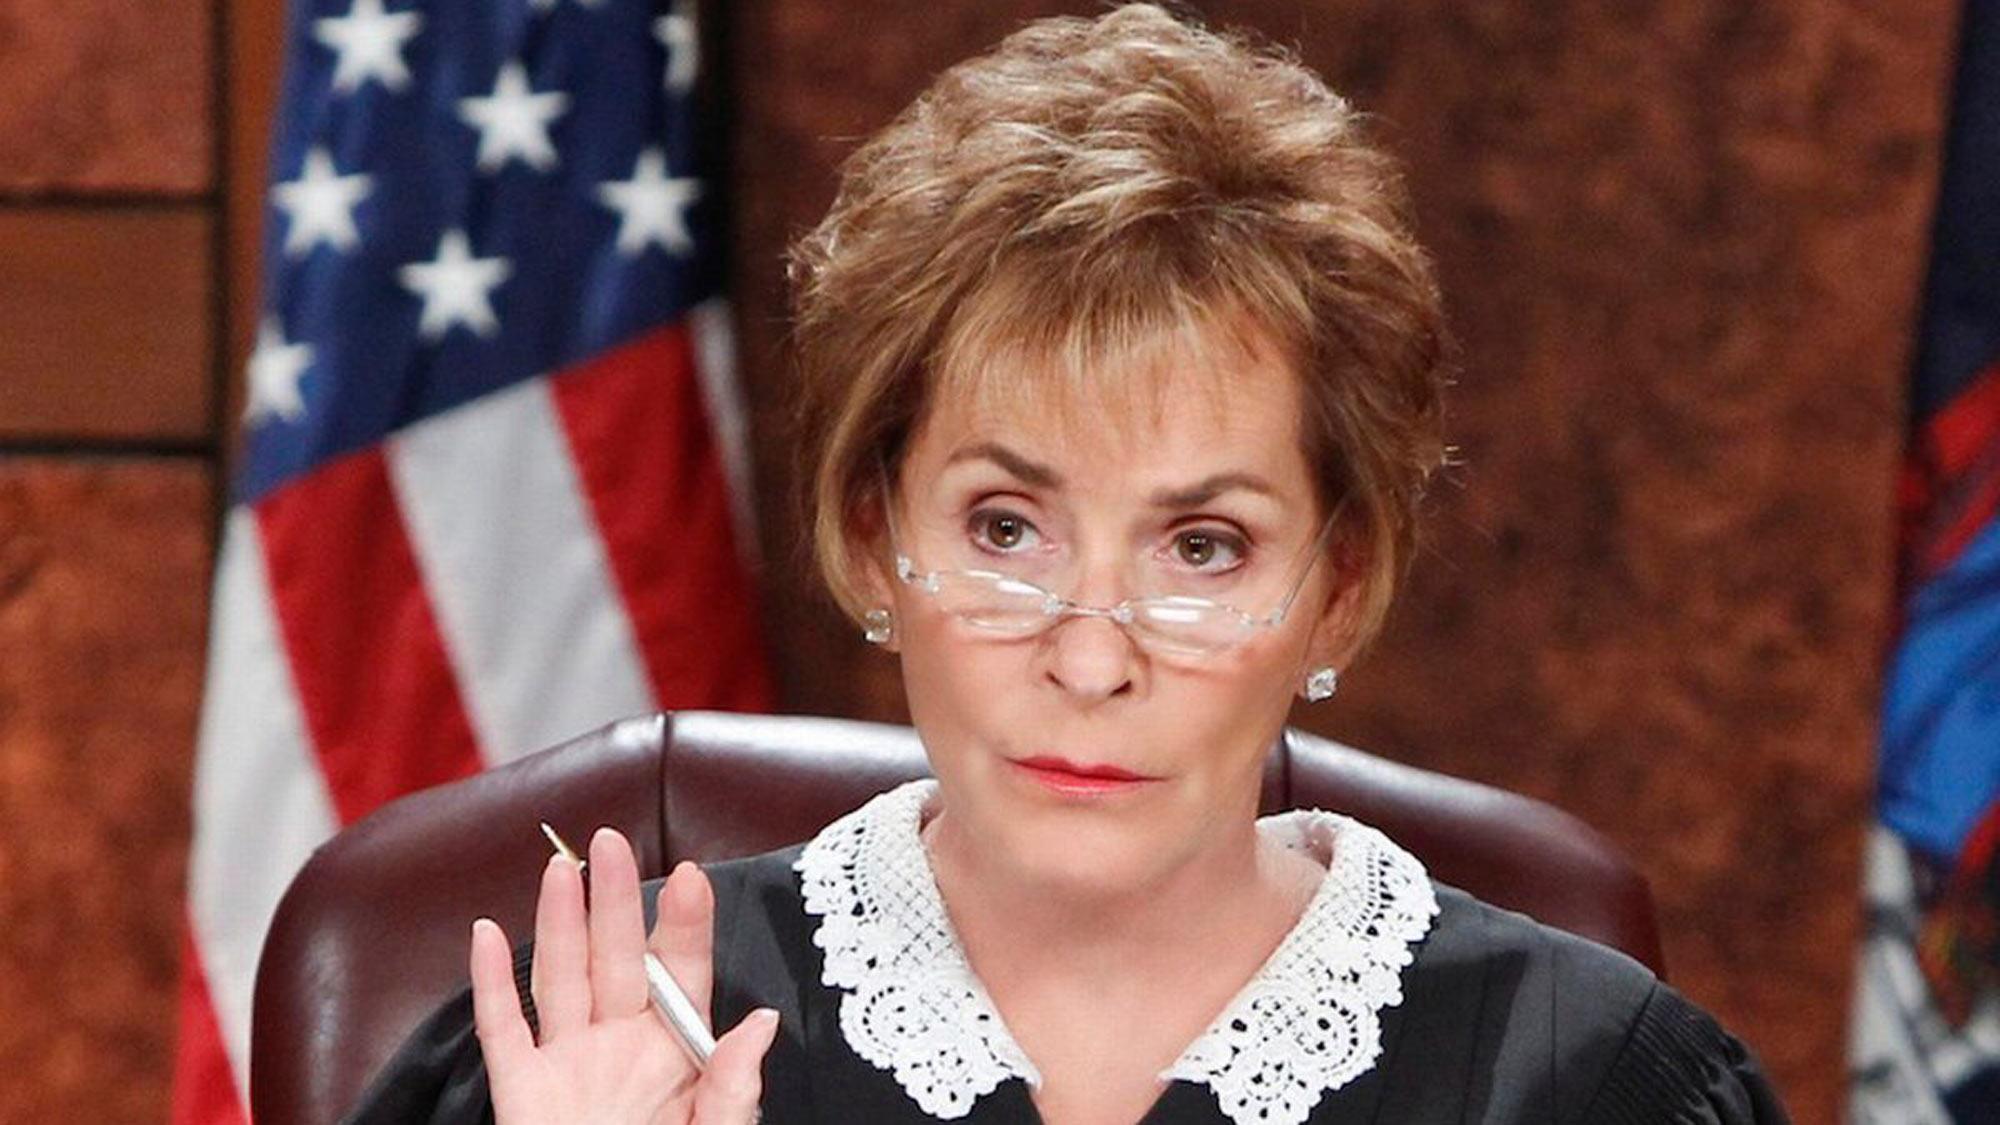 Canceled TV shows: Judge Judy